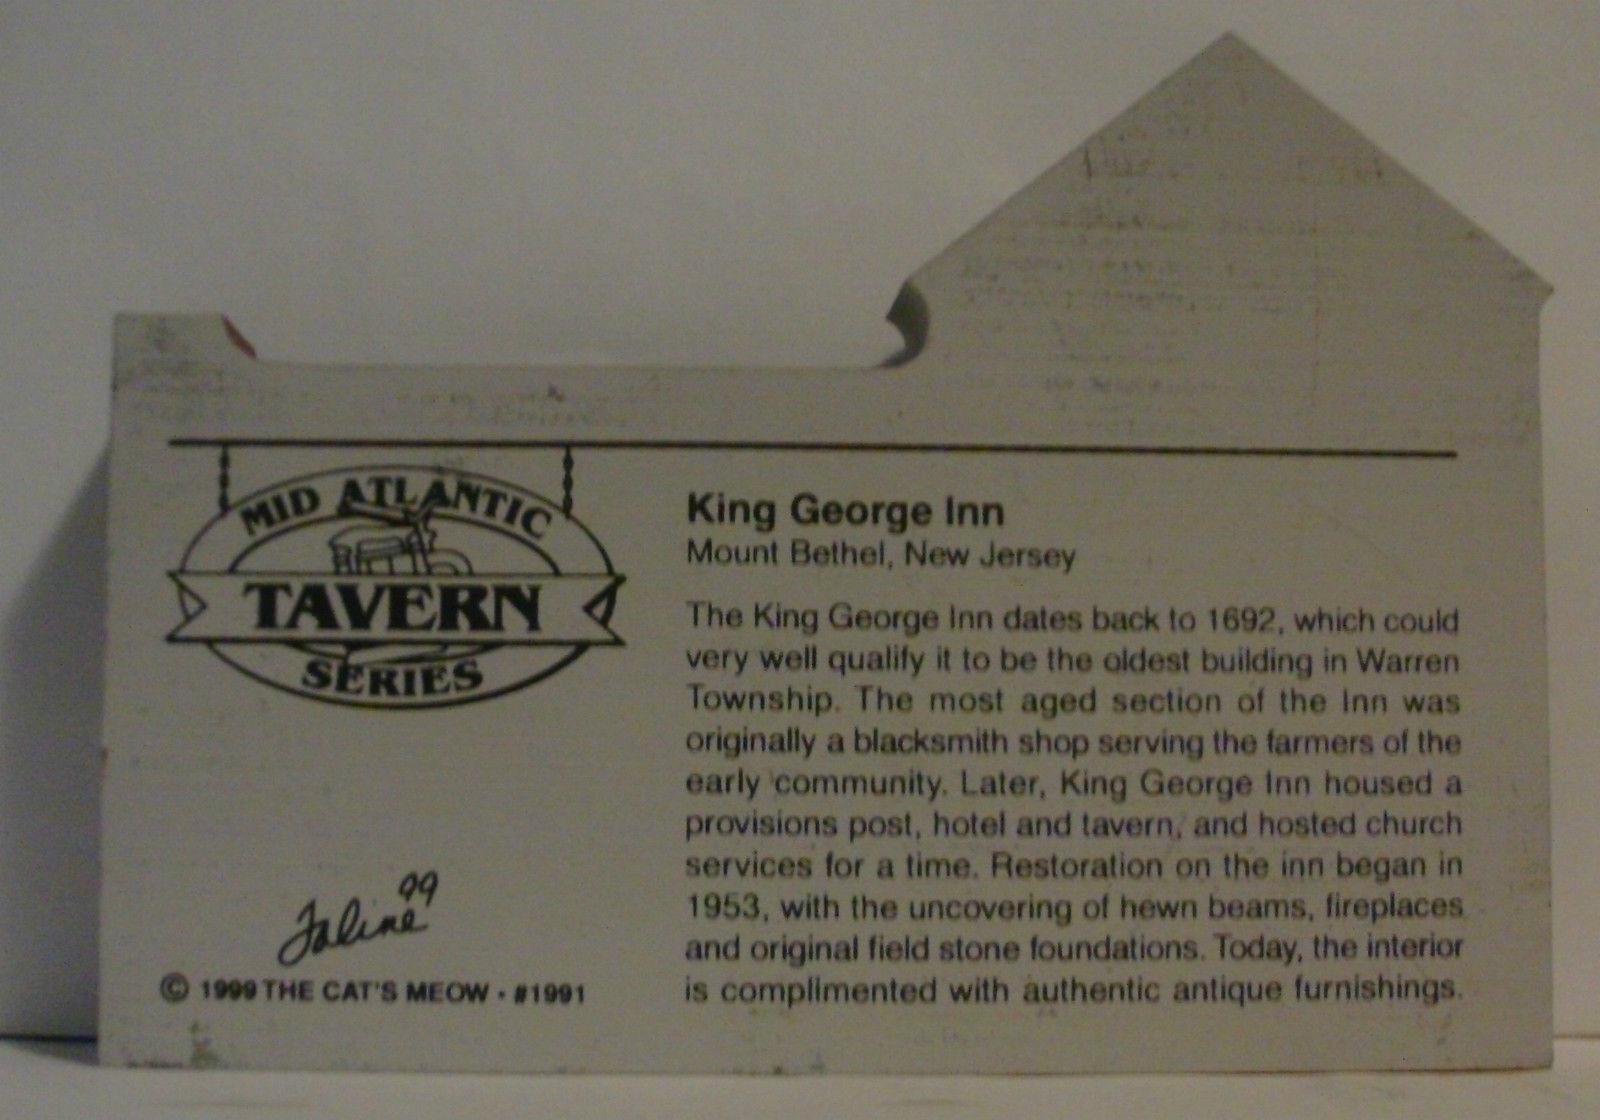 The Cats Meow Village 1999 Mid Atlantic Tavern Series King George Inn image 2